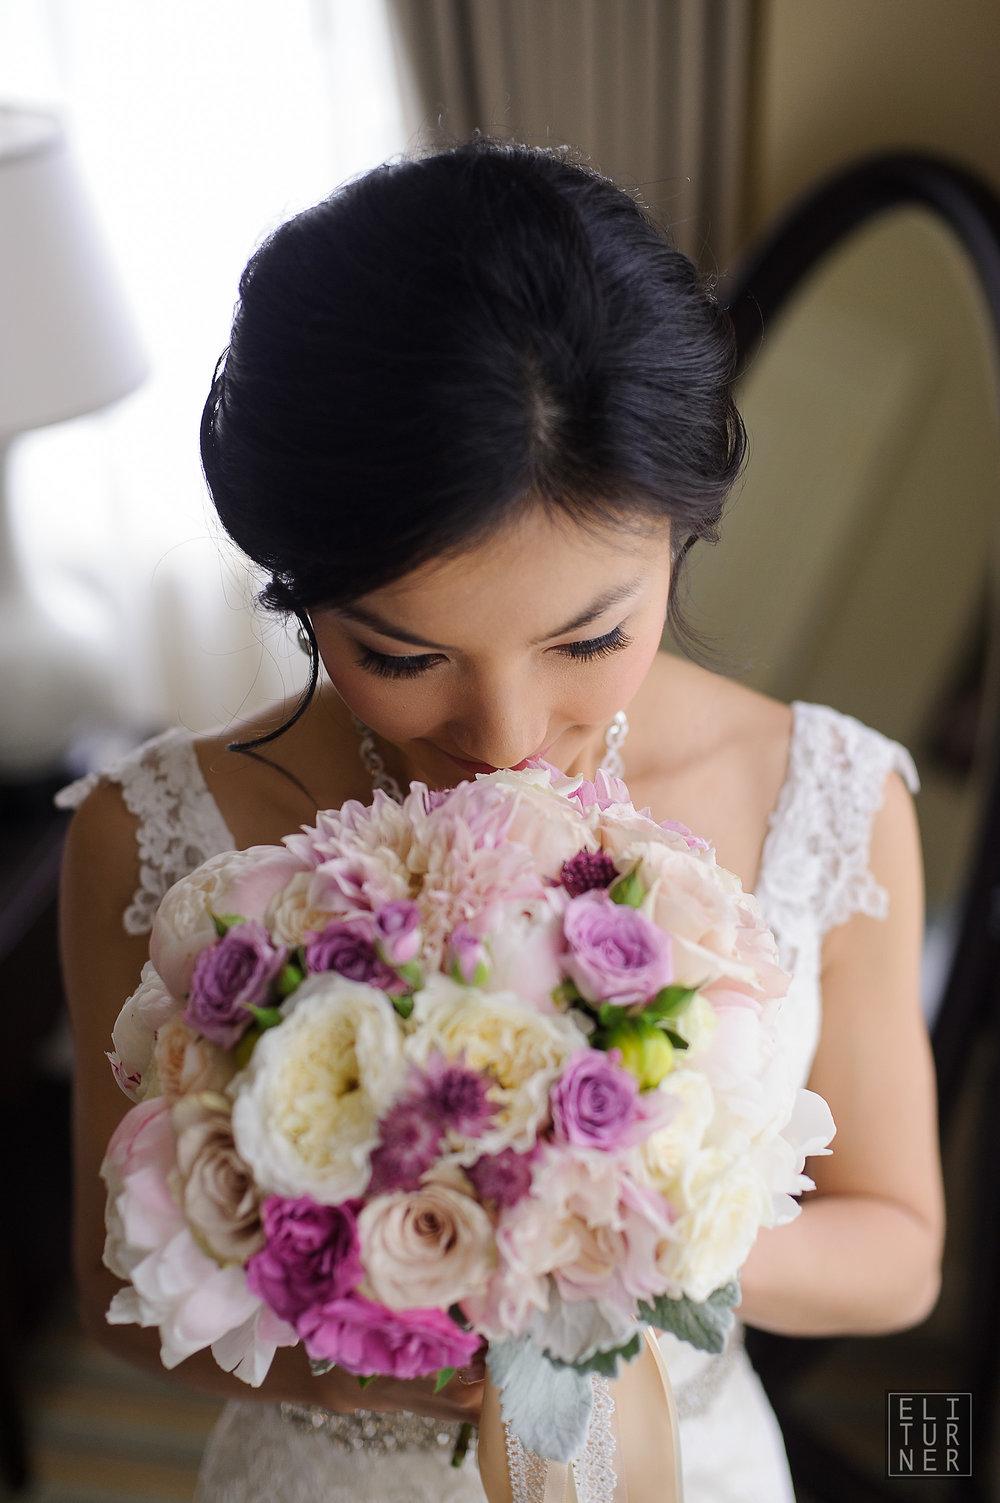 Turner-Jenny-smelling-bouquet.jpg